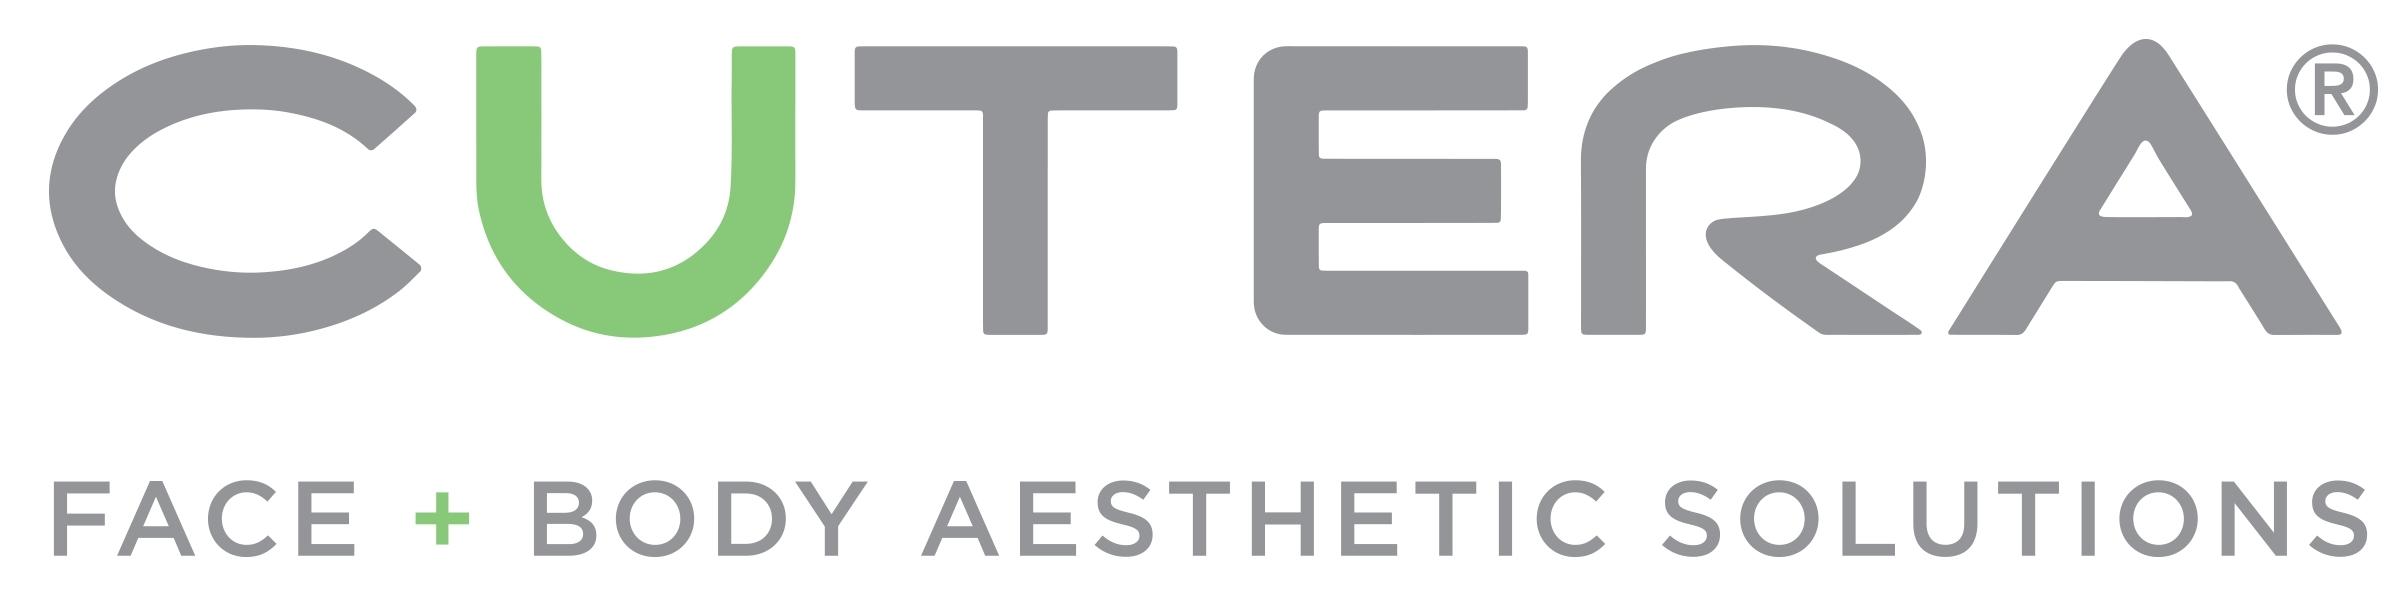 Risultati immagini per laser cutera logo